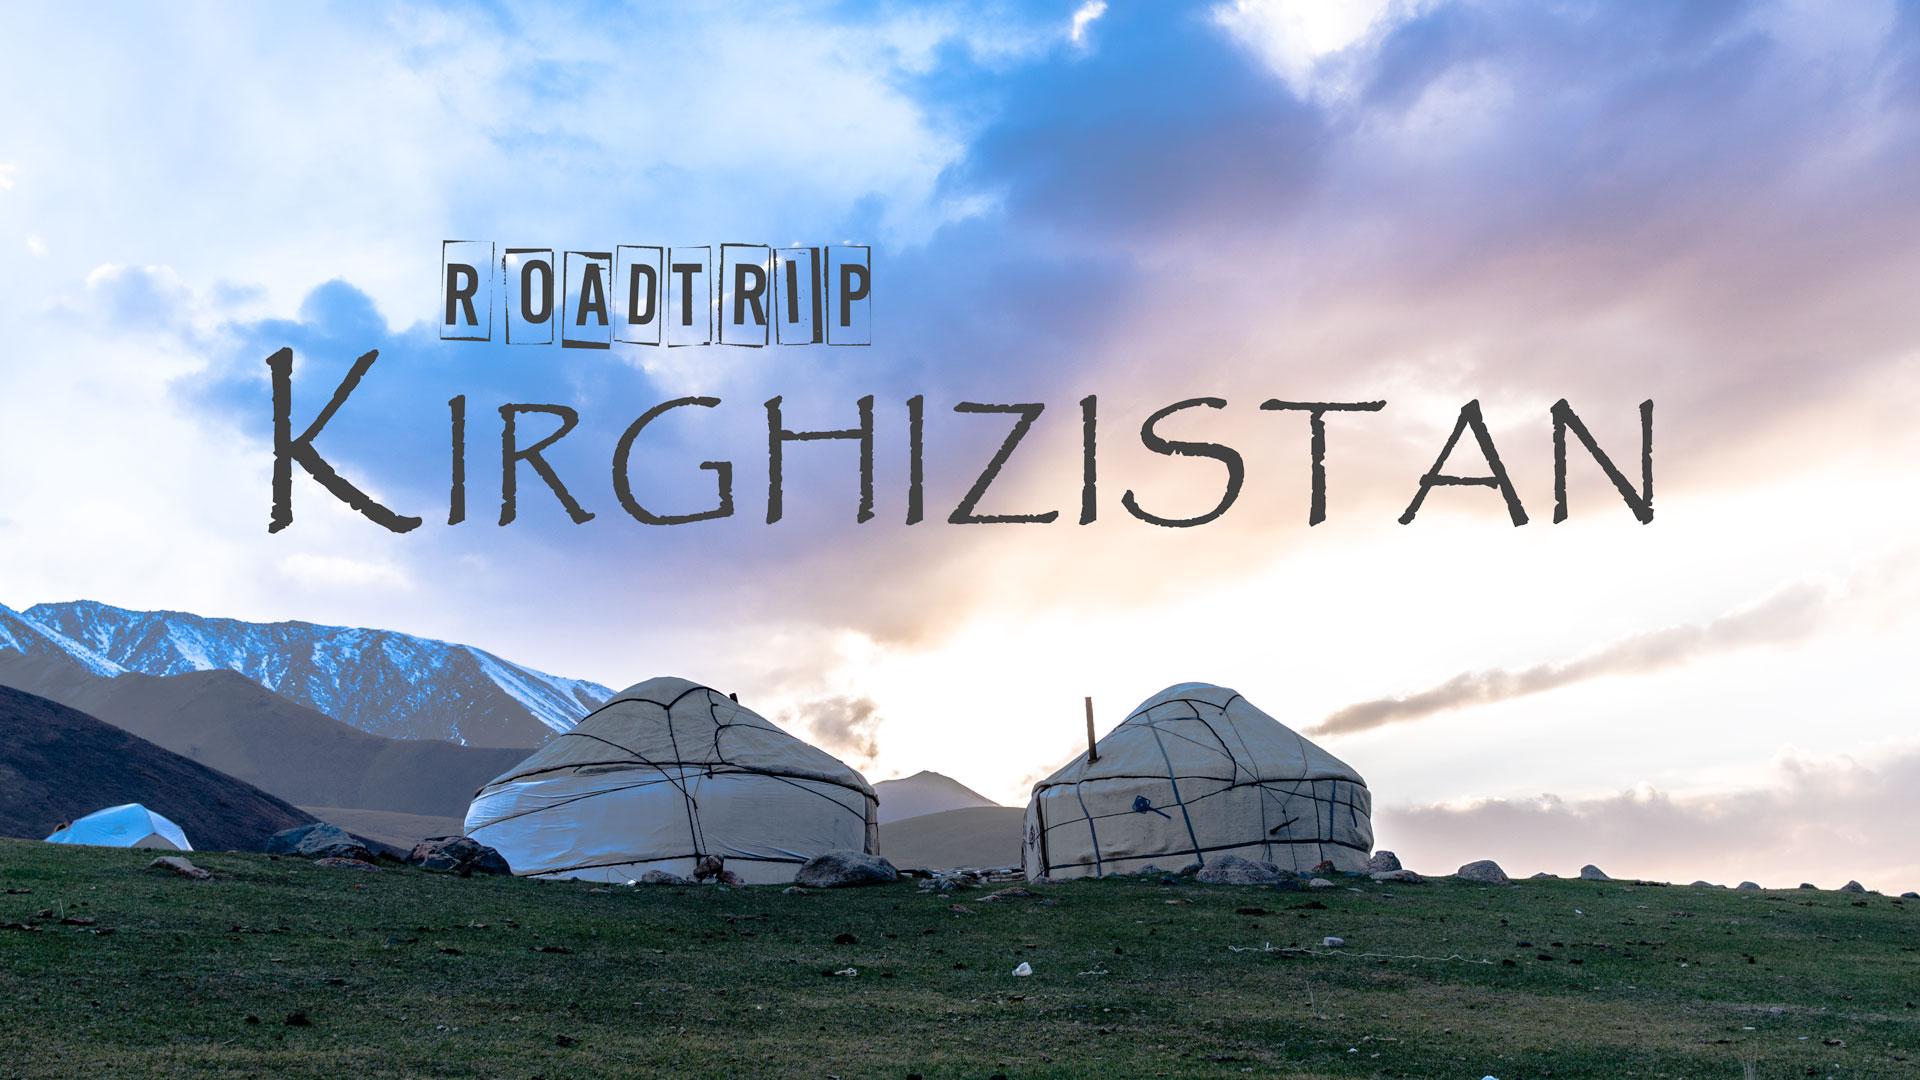 SerialHikers stop autostop world monde tour hitchhiking aventure adventure alternative travel voyage sans avion no fly Kyrgyzstan Kirghizistan roadtrip newsletters